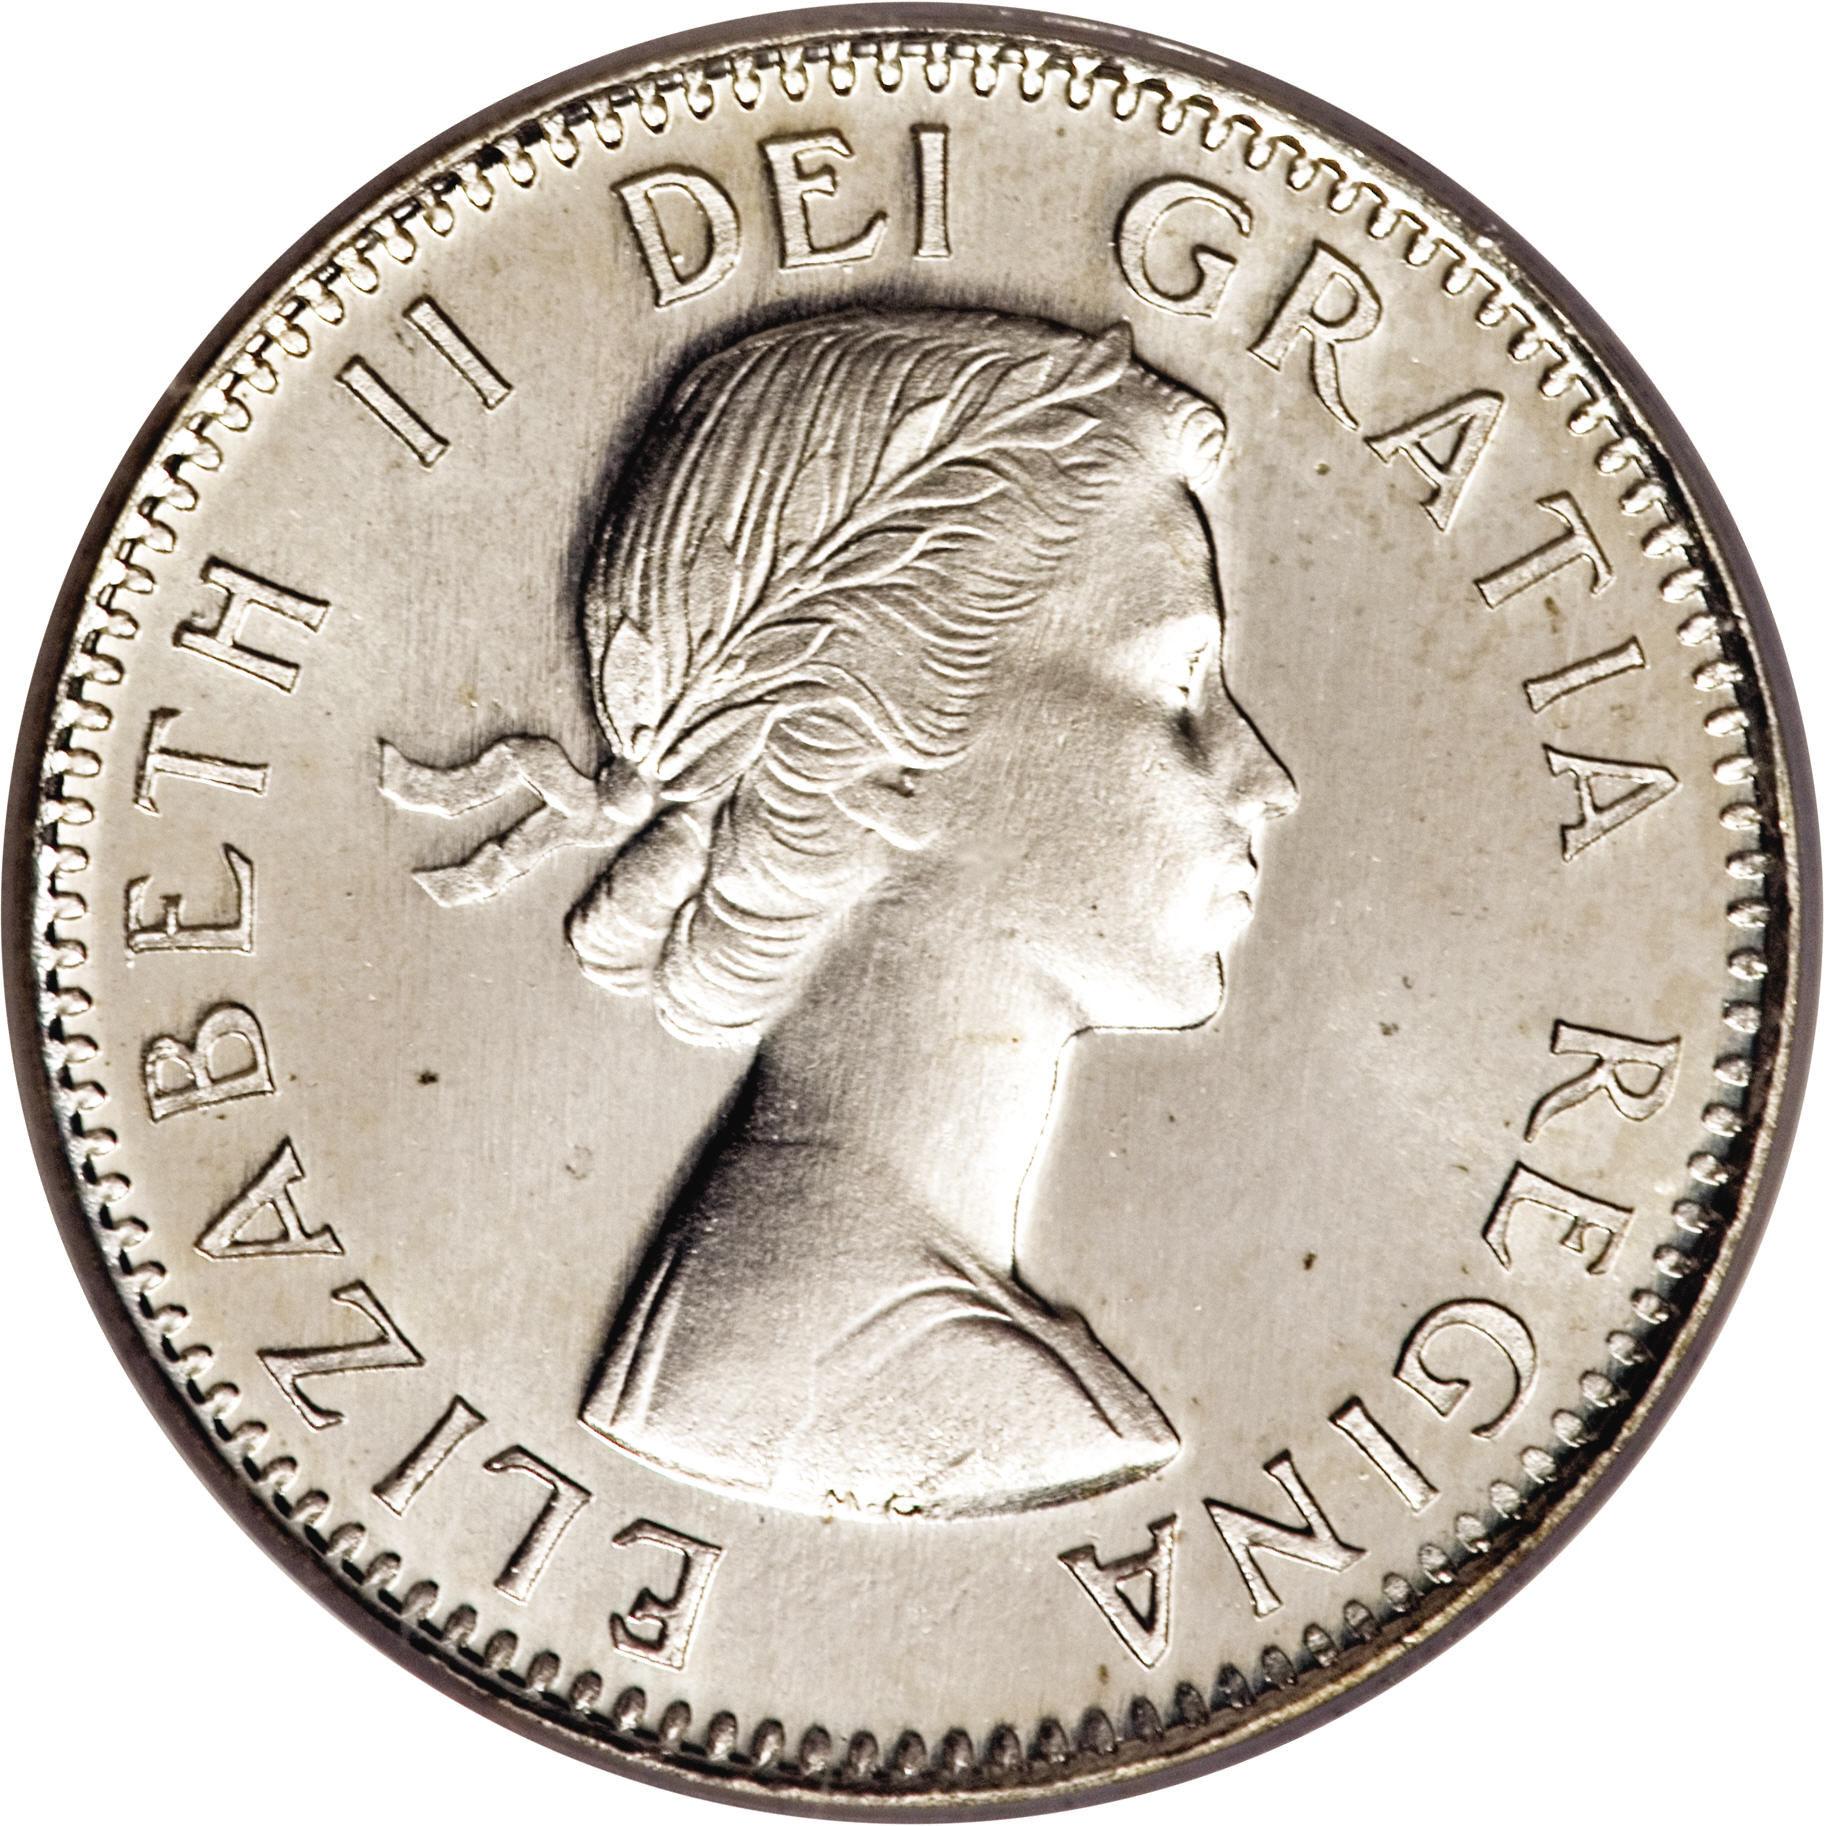 10 Cents Elizabeth Ii 1st Portrait Canada Numista